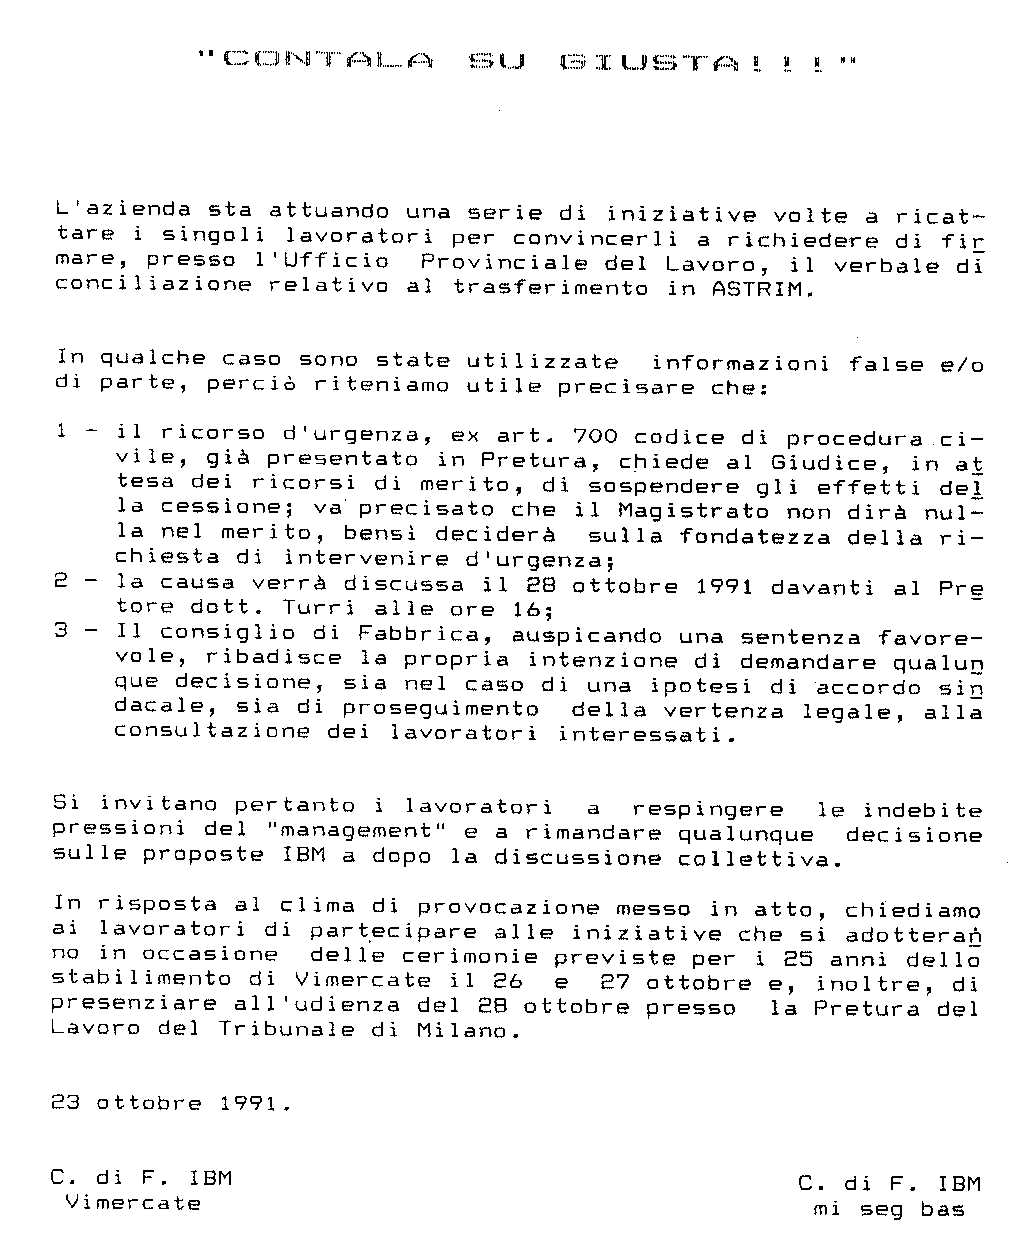 RSU IBM Italia - CONTALA SU GIUSTA !!! Astrim (911023.htm)